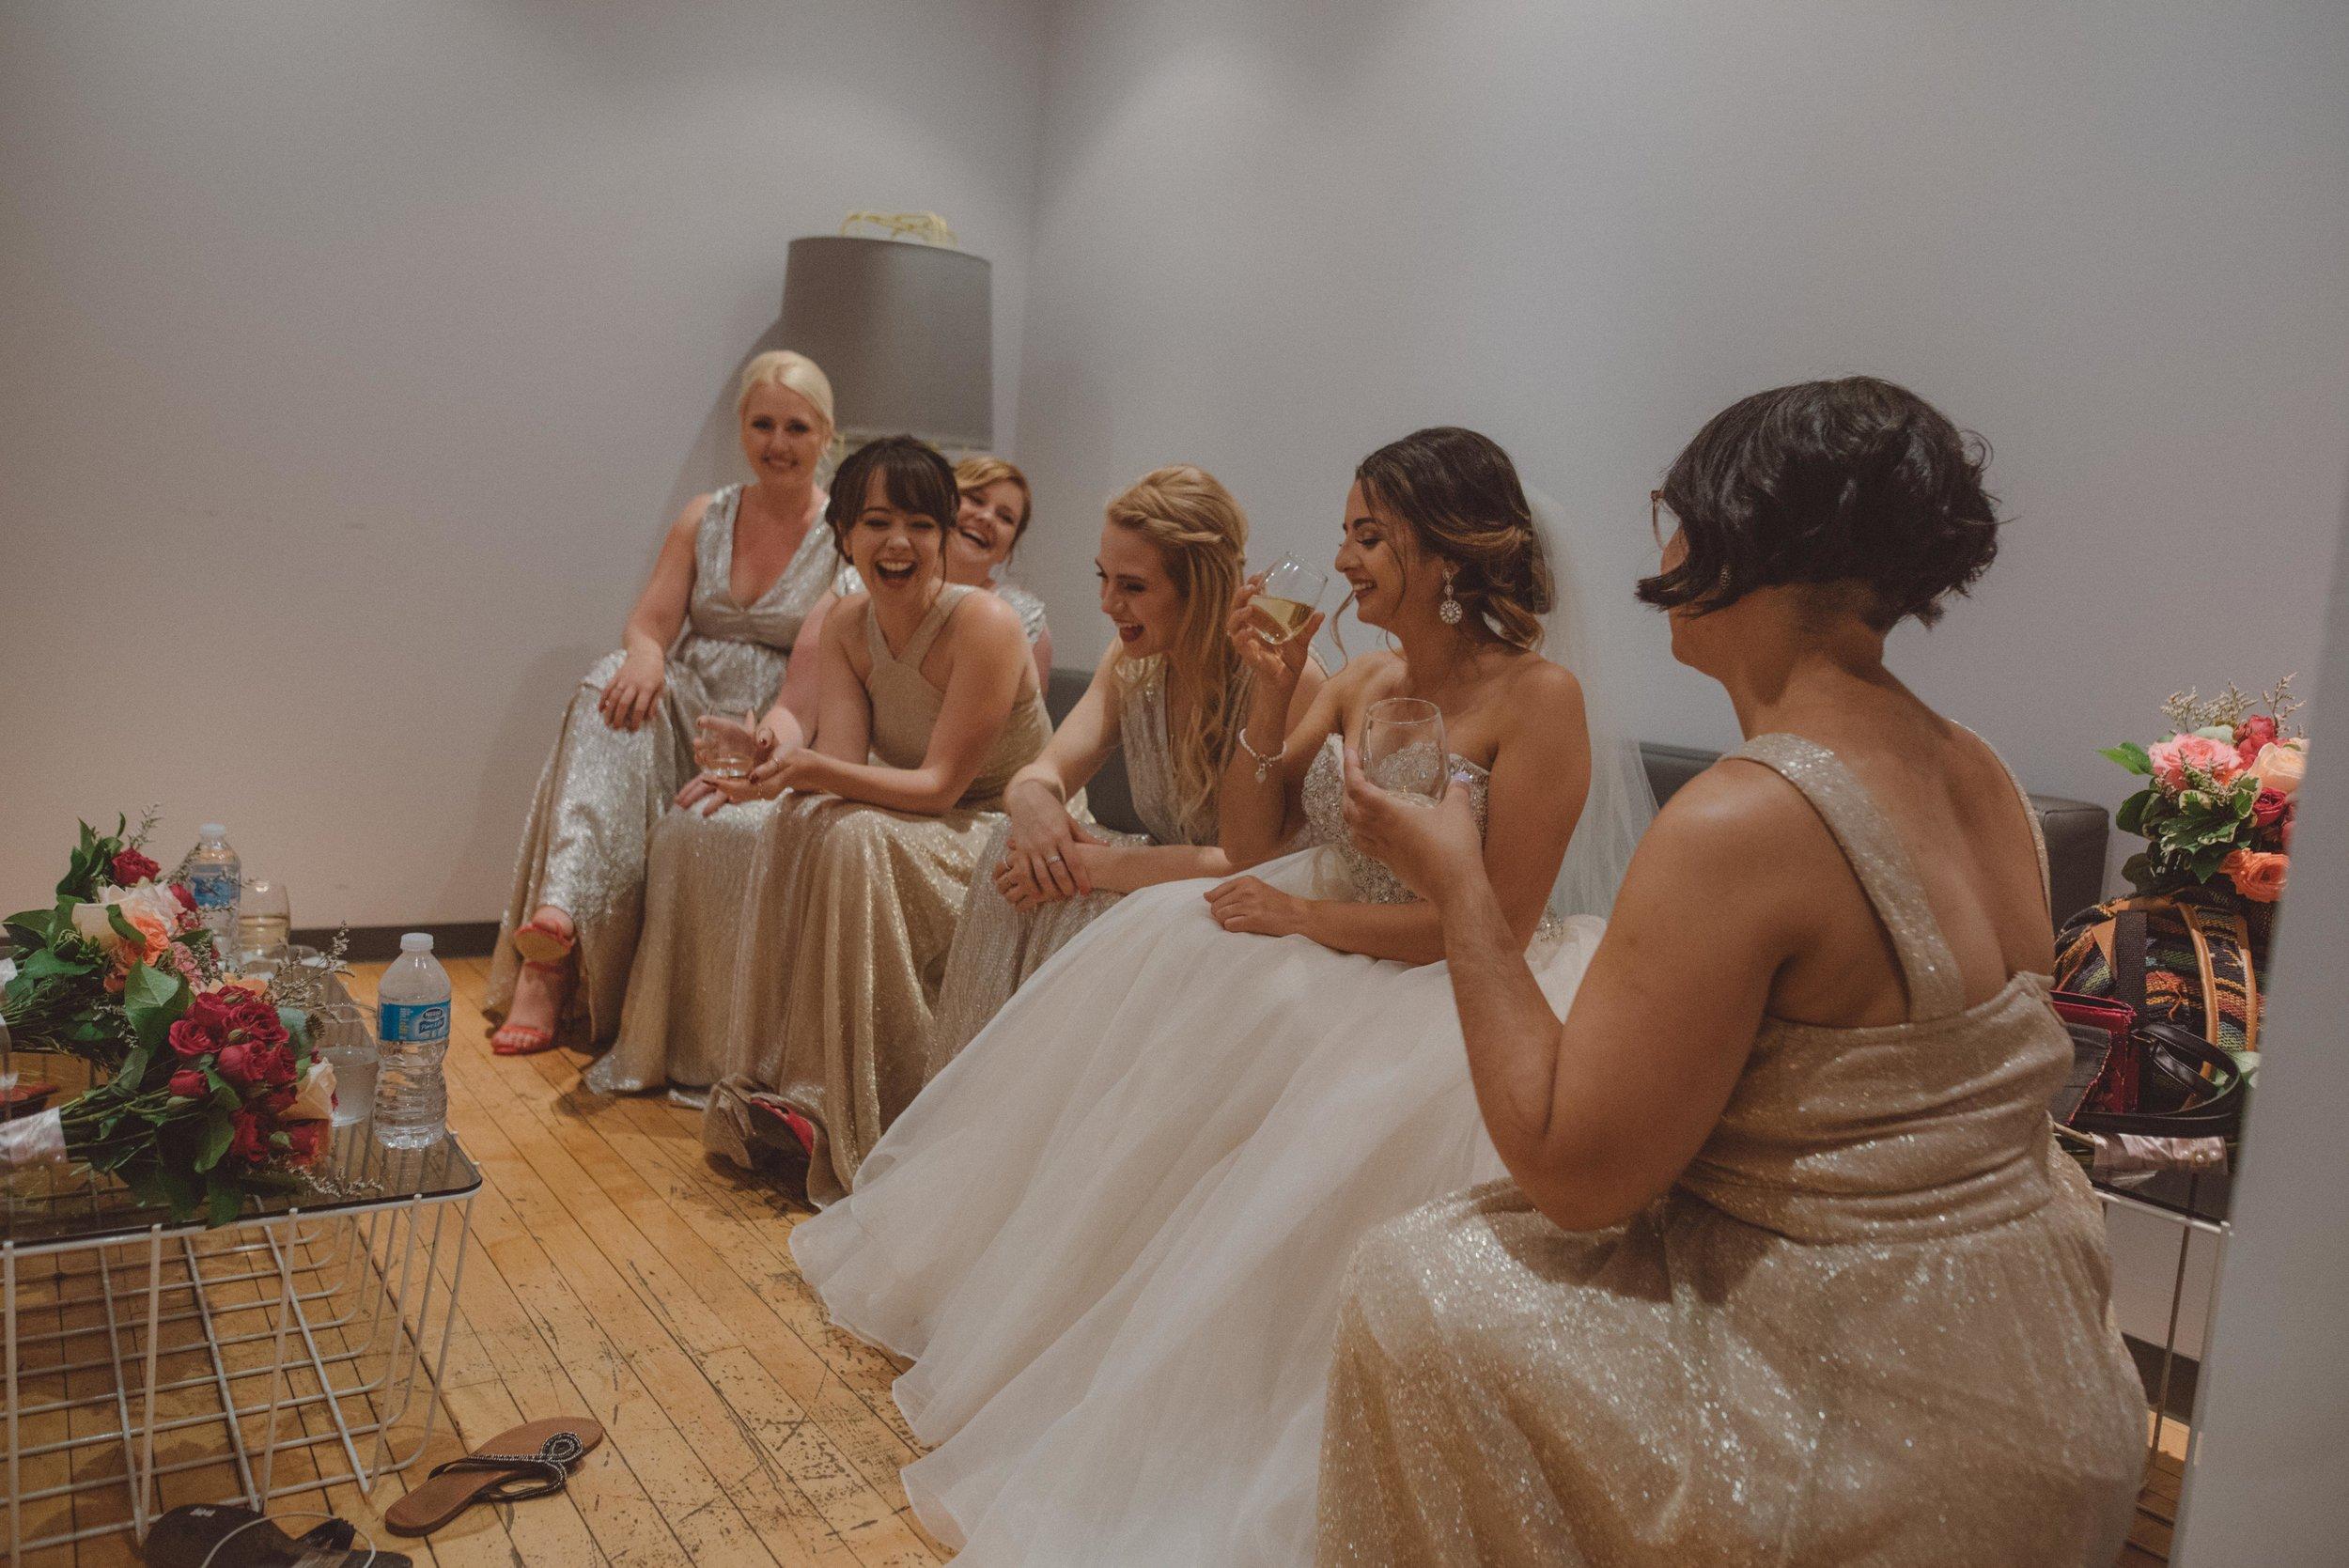 mariage_photographe_toronto_gatineau_ottawa_photographer_wedding-43.jpg